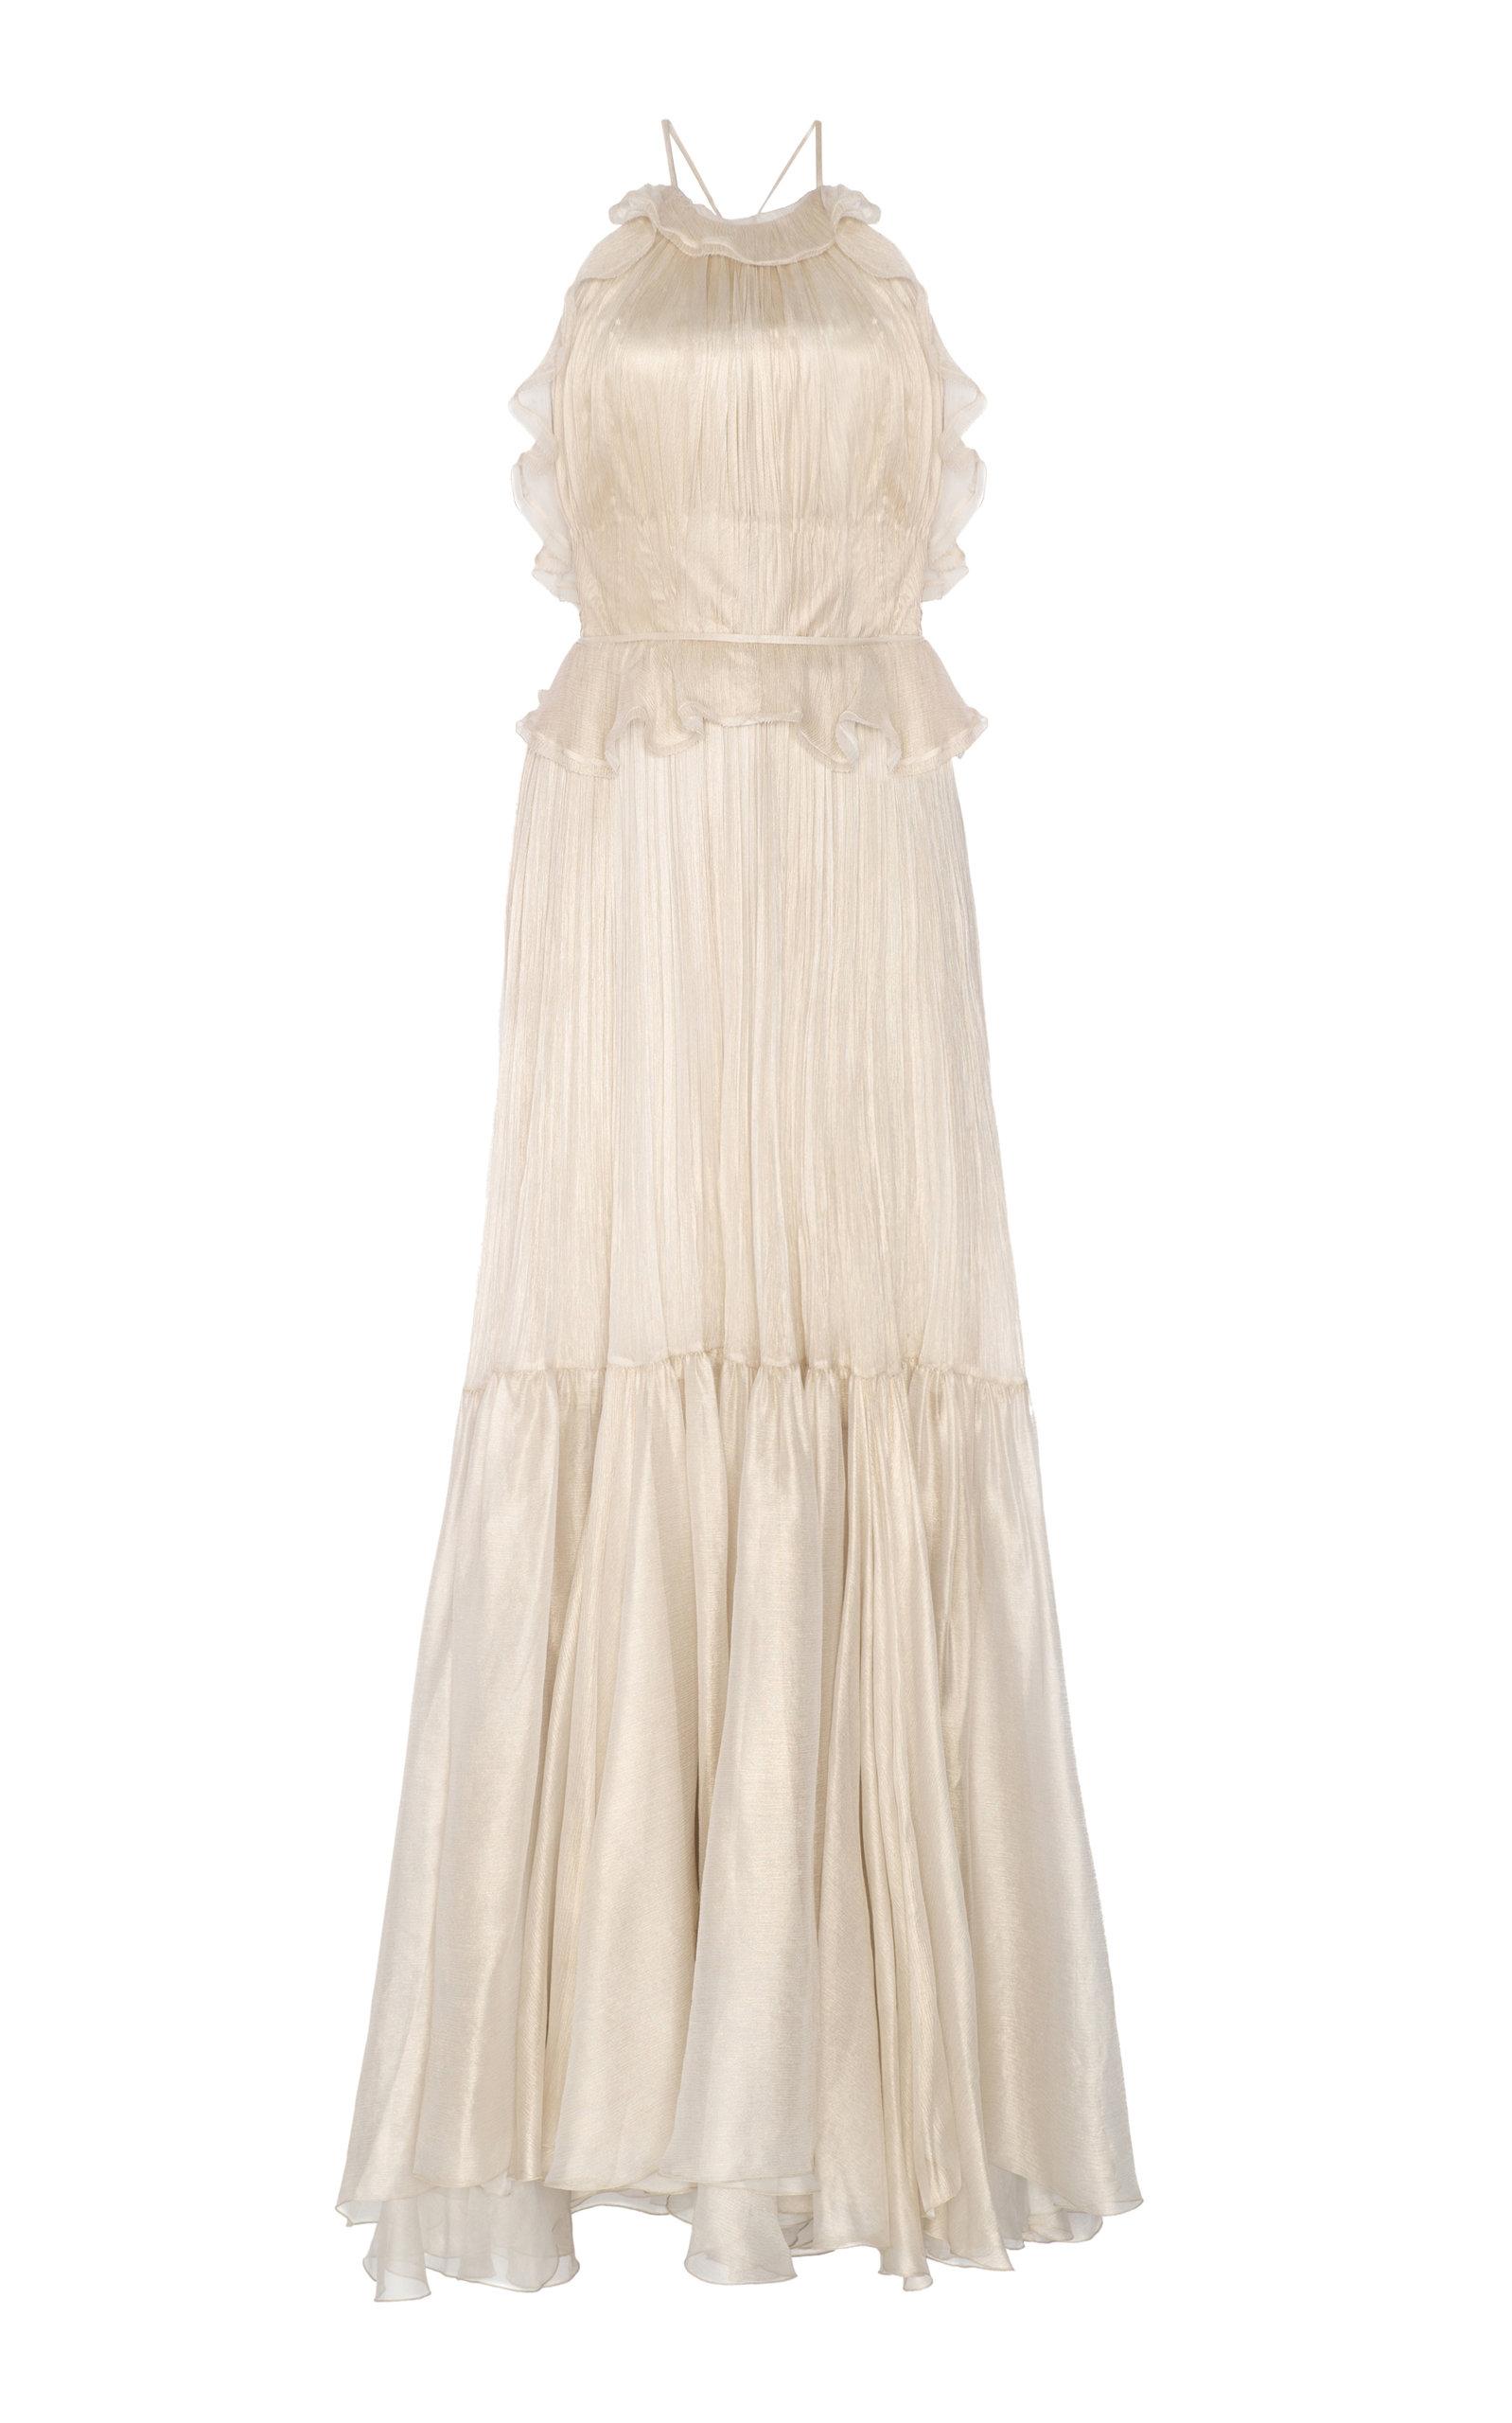 MARIA LUCIA HOHAN PEARL METALLIC MOUSSELINE DRESS